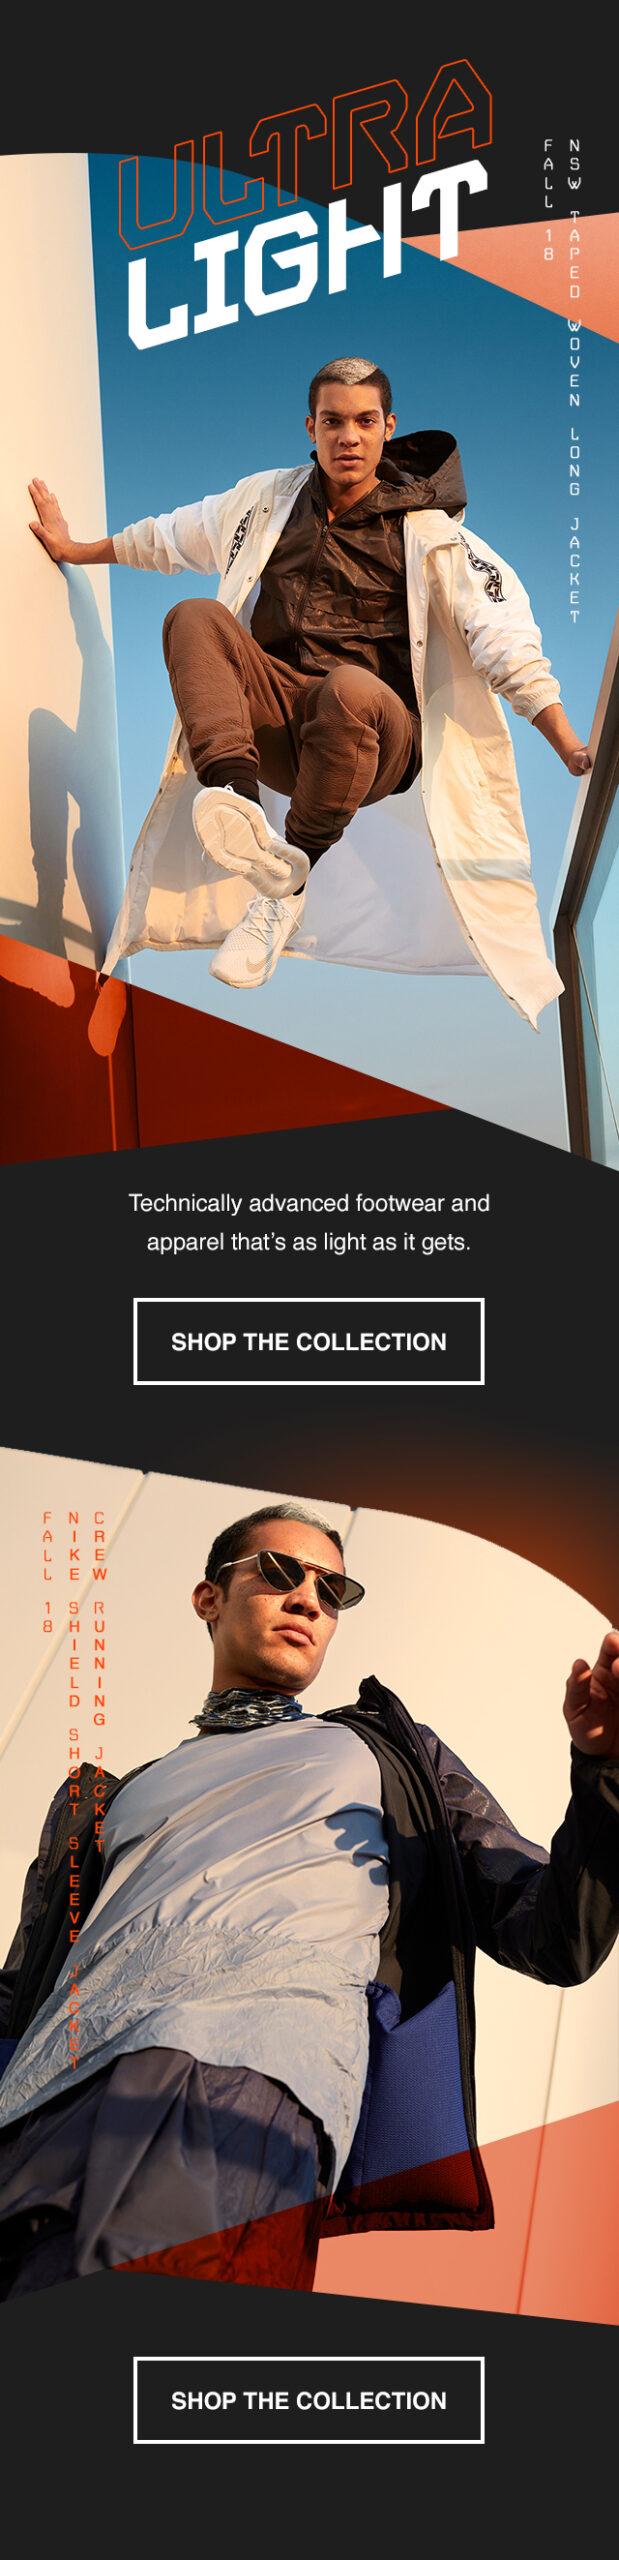 Nike_Email_Design_Men_01